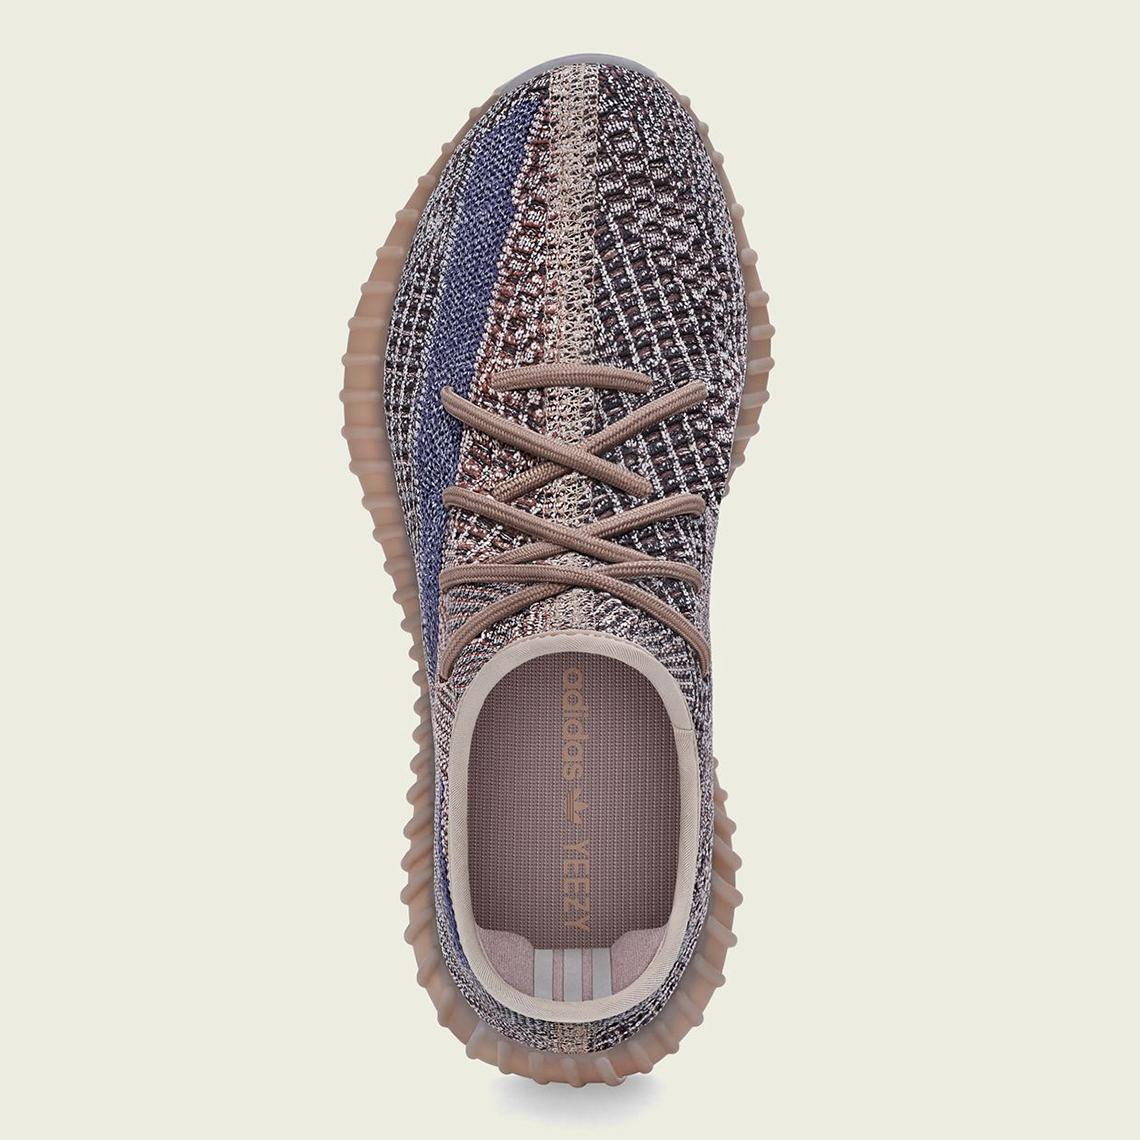 adidas Yeezy Boost 350 V2 ''Fade'' - H02795